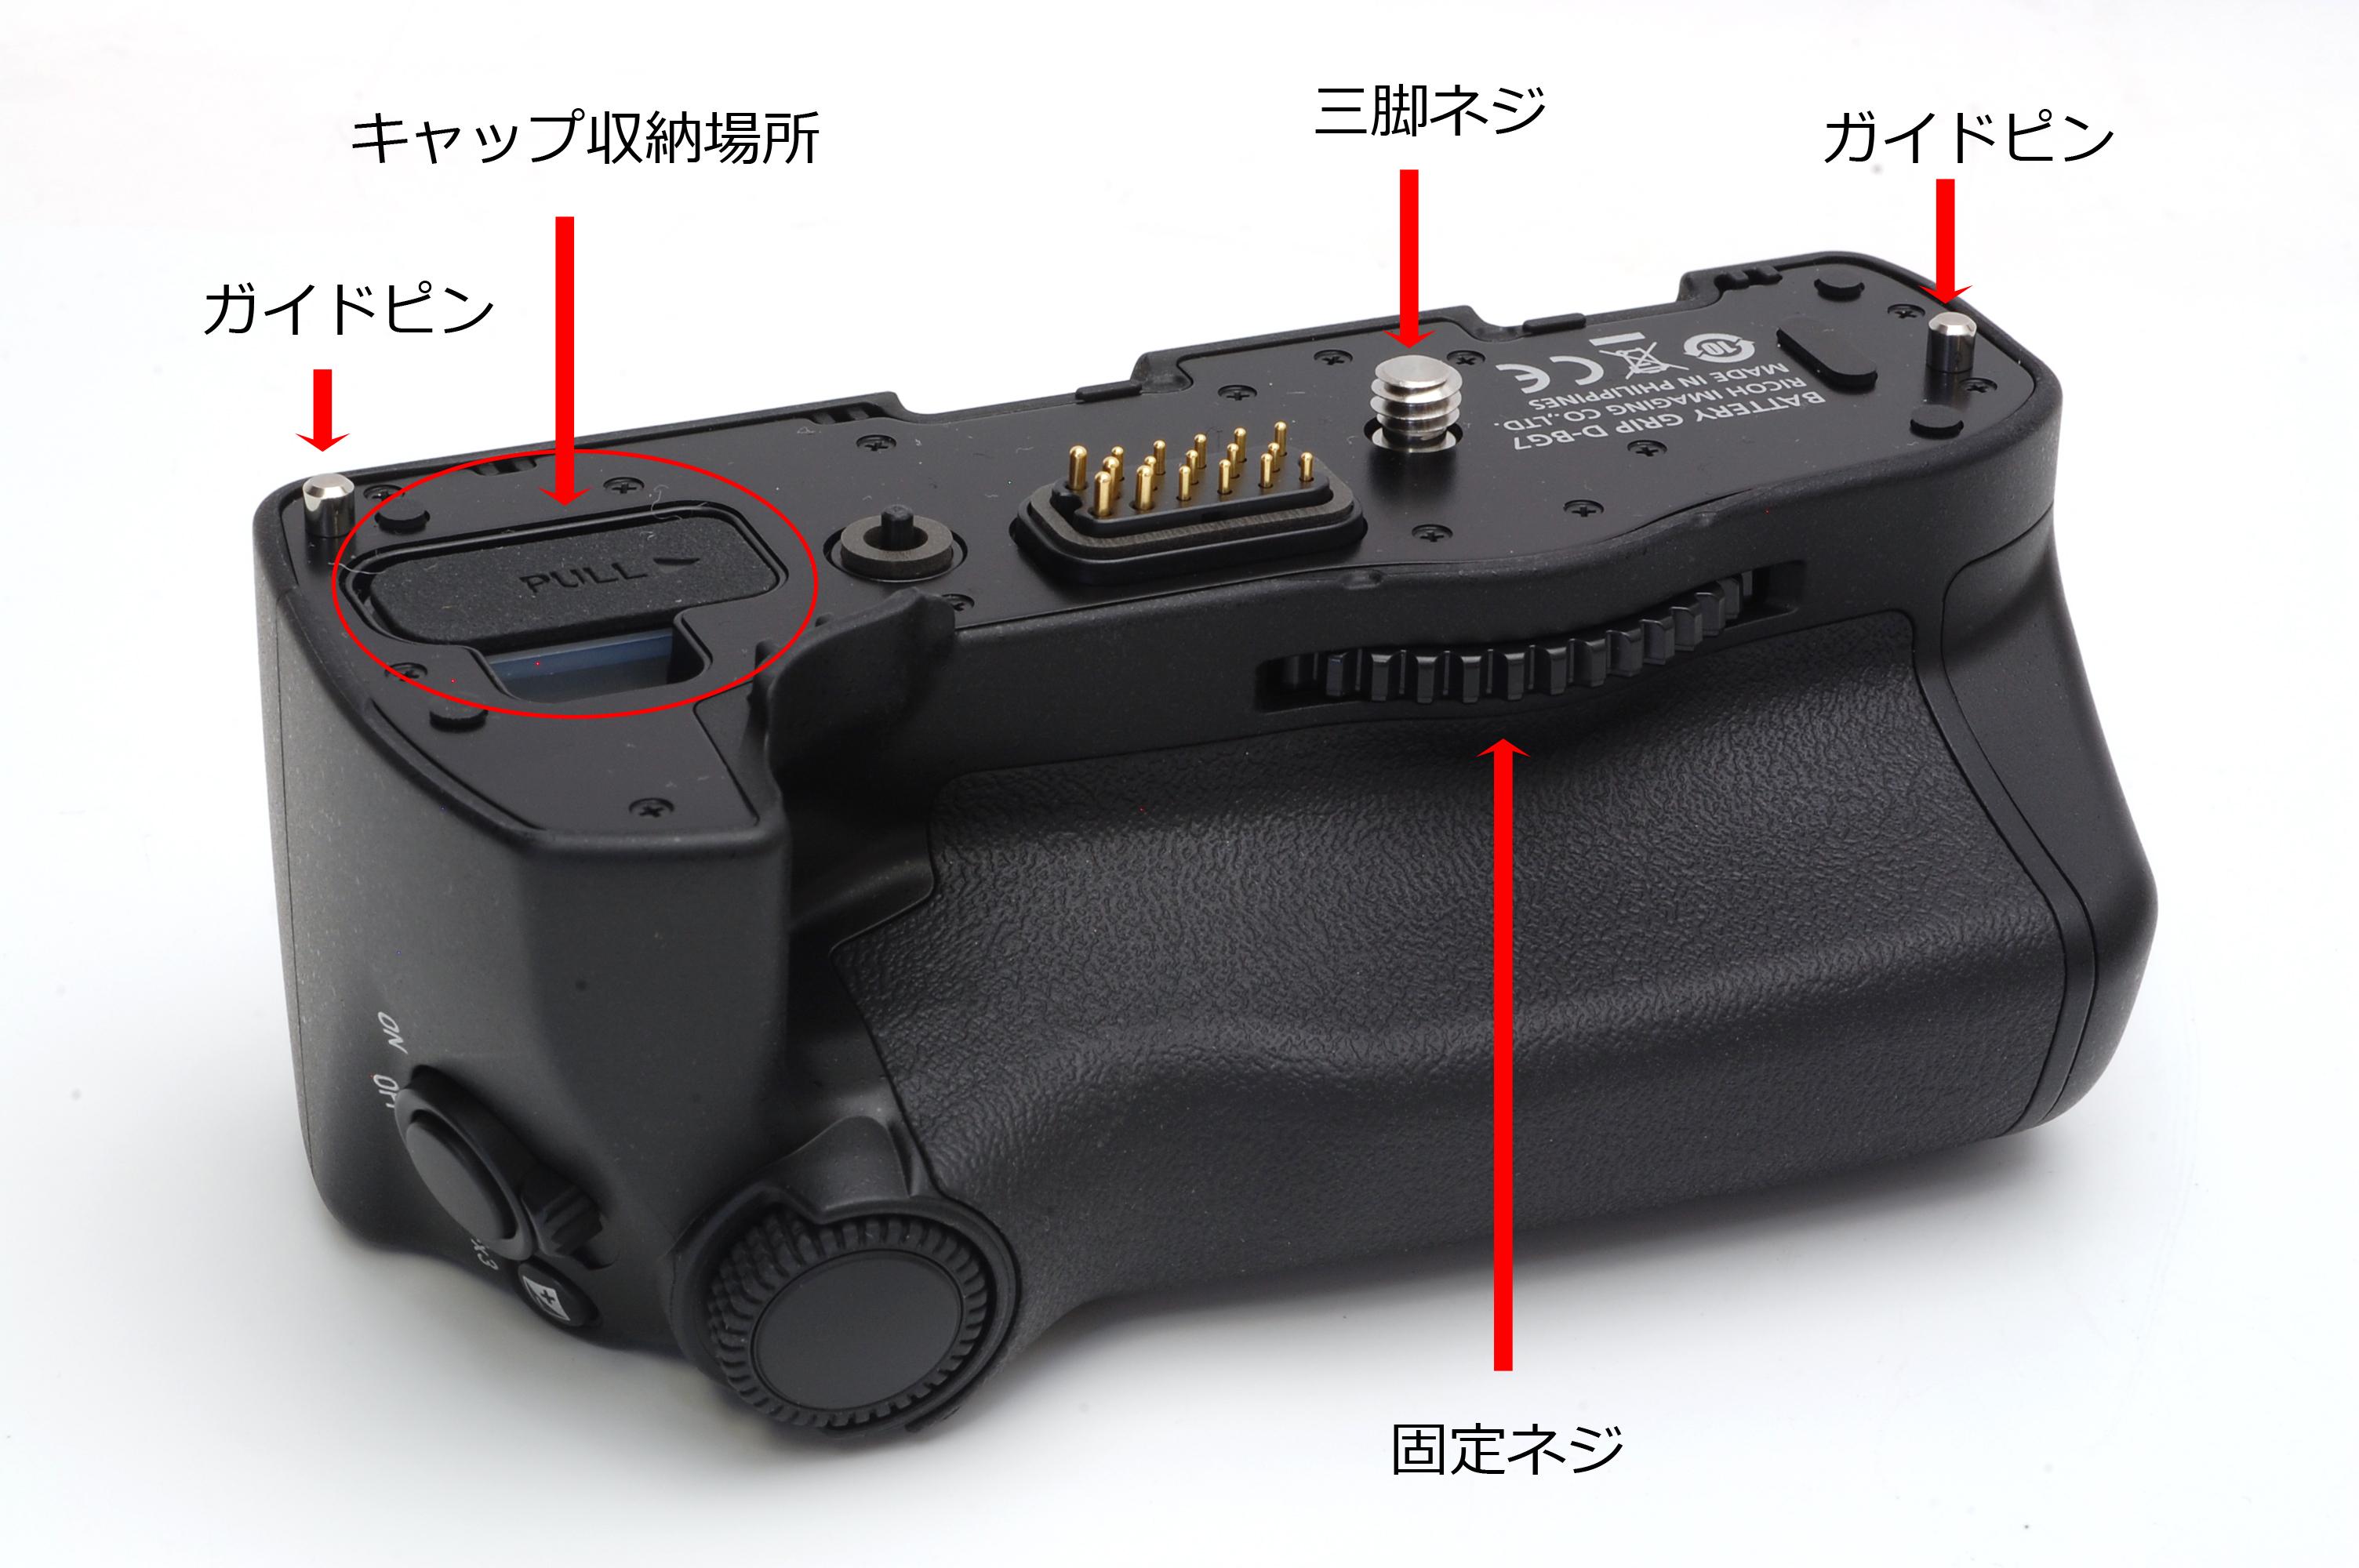 http://www.yaotomi.co.jp/blog/used/PENTAX_D-BG7-022.jpg